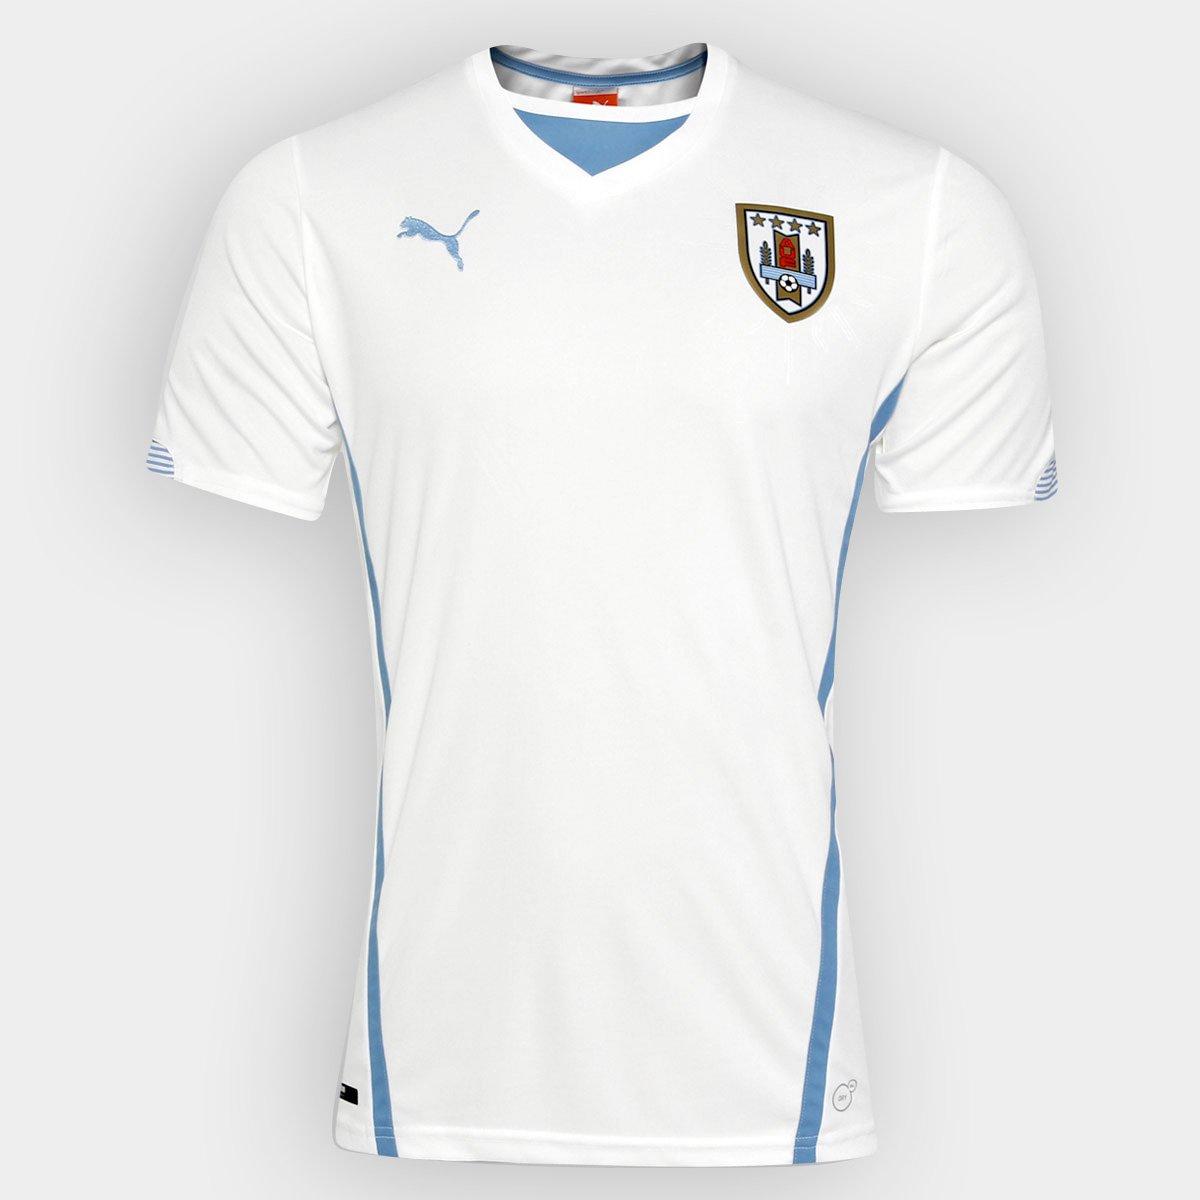 Camisa Seleção Uruguai Away 14 15 s nº - Torcedor Puma Masculina - Compre  Agora  8aaa469c3fb82